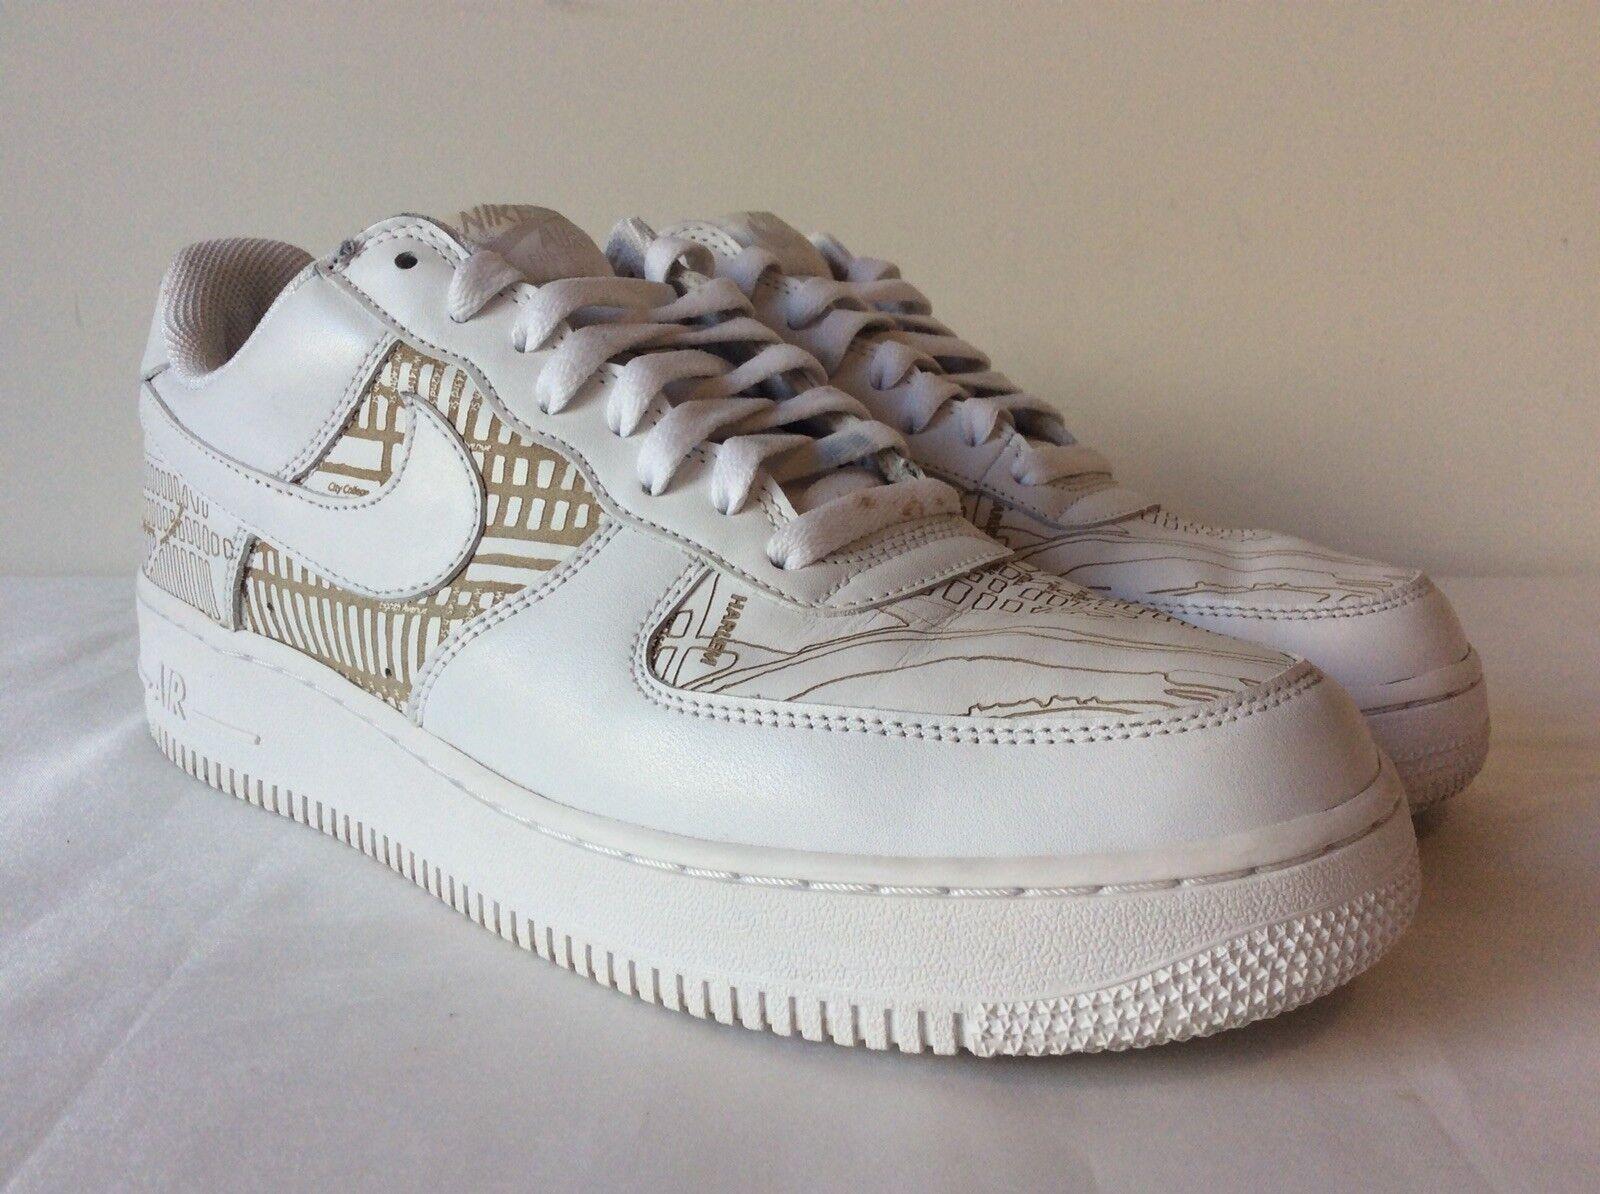 Nike Air Force 1 Low Premium Harlem Laser 2005 White 309096 111 Mens Sz 9.5